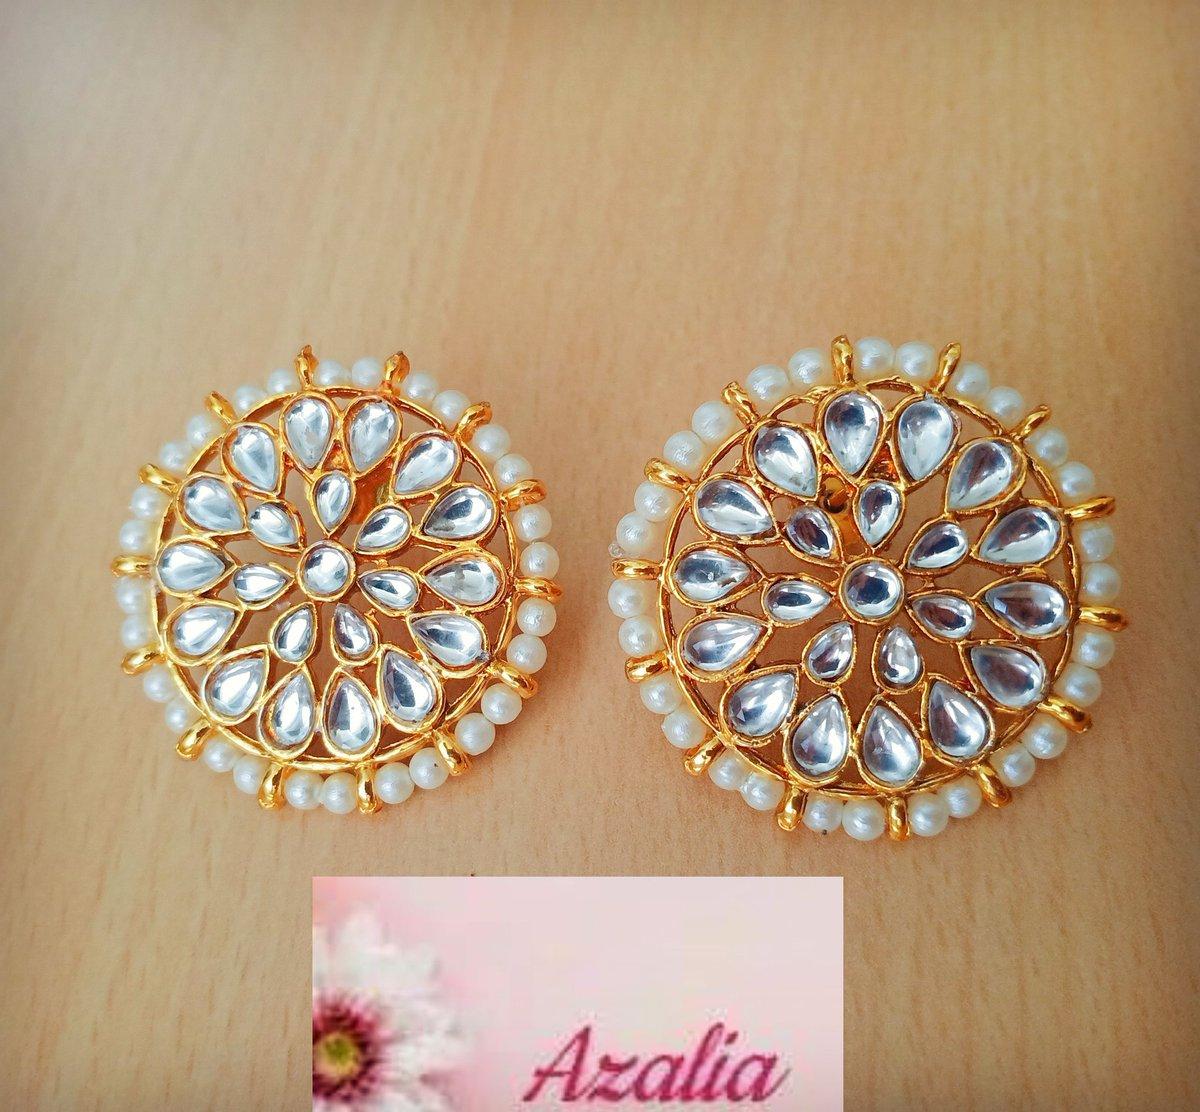 For buying visit https://azalia.in  #statementjewelry #designeranarkali #designerlehenga  #indianjewellery #bangalore #weddingjewellery #weddingsarees #indiandressesonline #denimjacket #oxidizejewellery #fashionearrings #sikhweddings #girlsboots #designerjewellery   #ringspic.twitter.com/E9bWsJt5dT